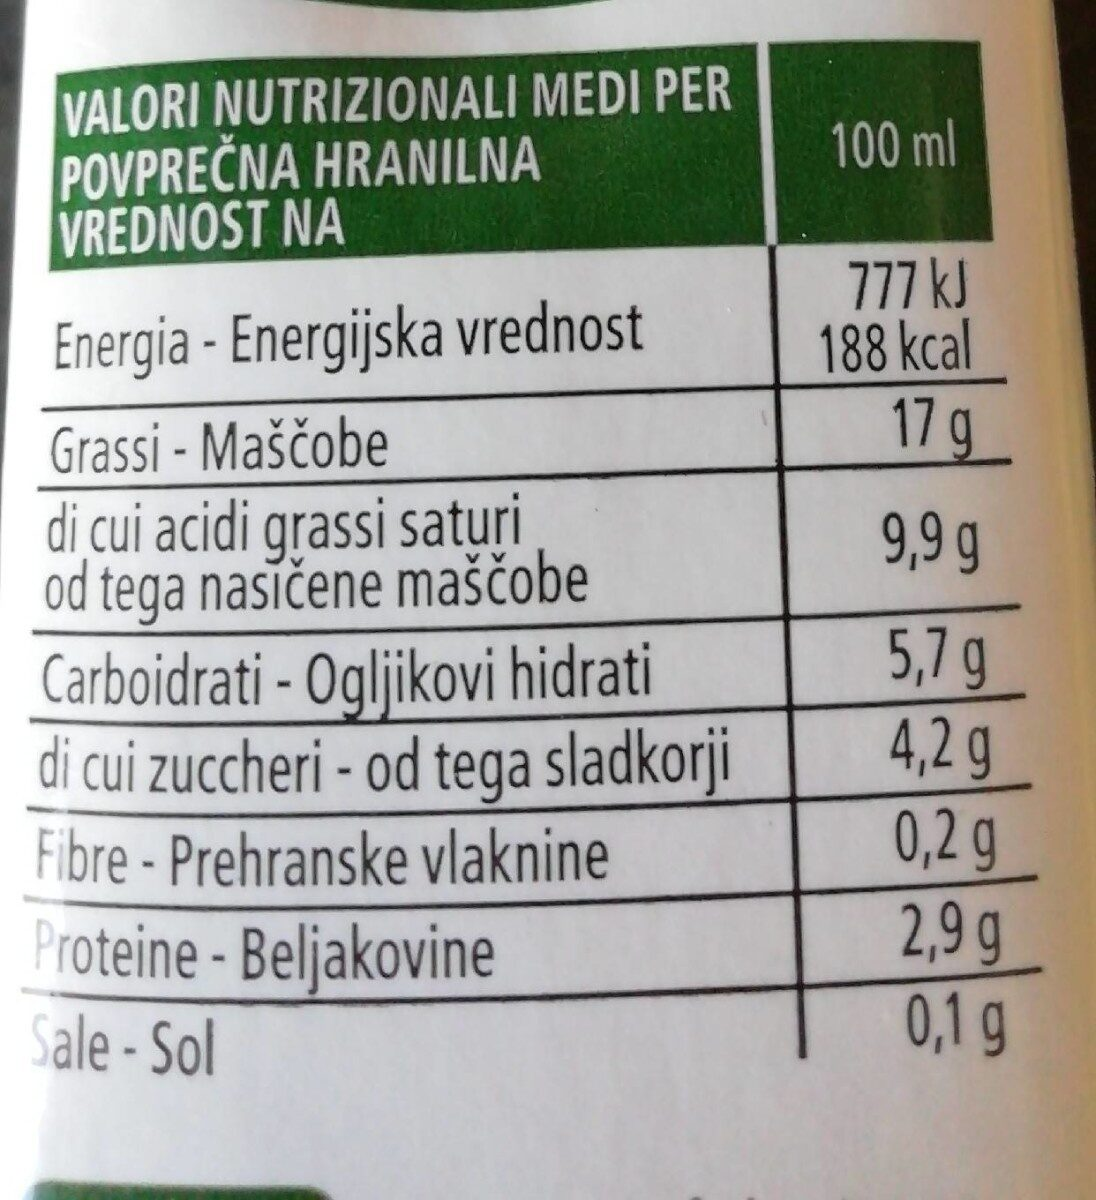 Panna vegetale soia - Nutrition facts - it